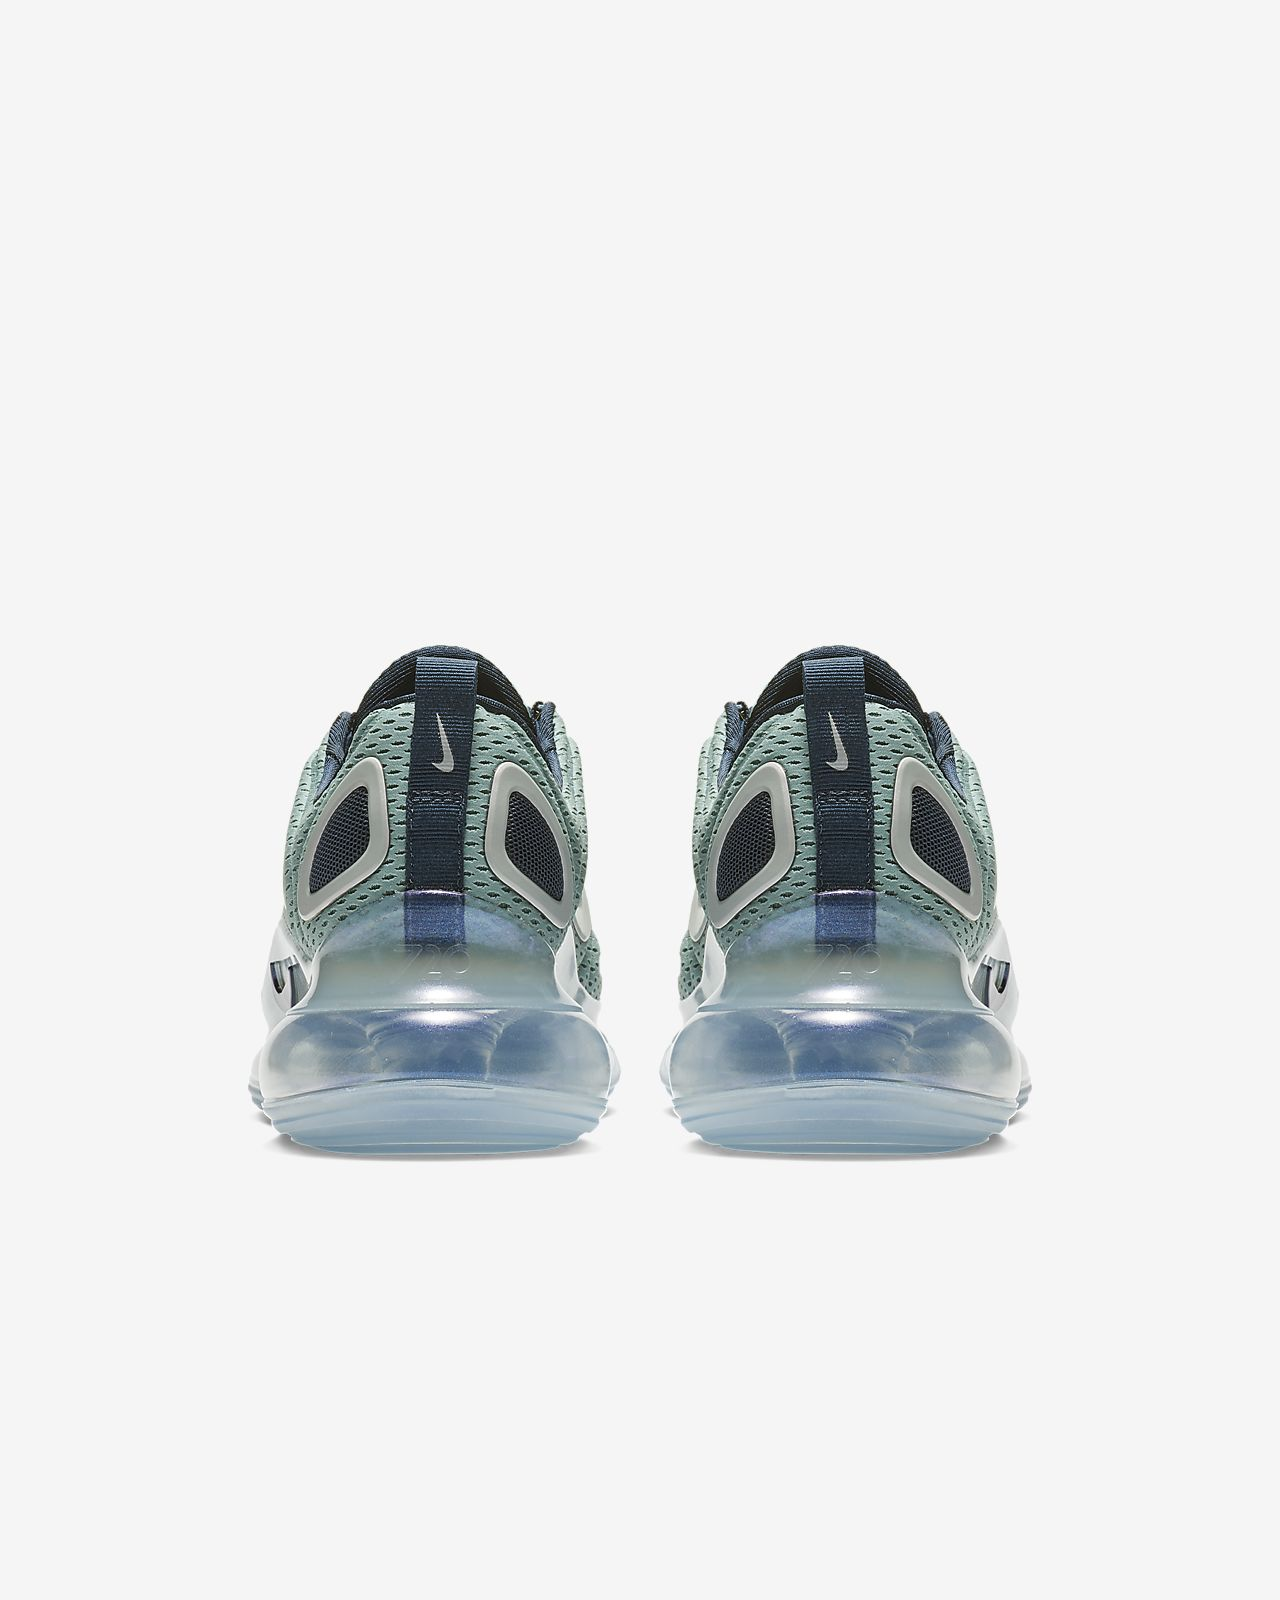 0d2e3be90 Nike Air Max 720 Women s Shoe. Nike.com